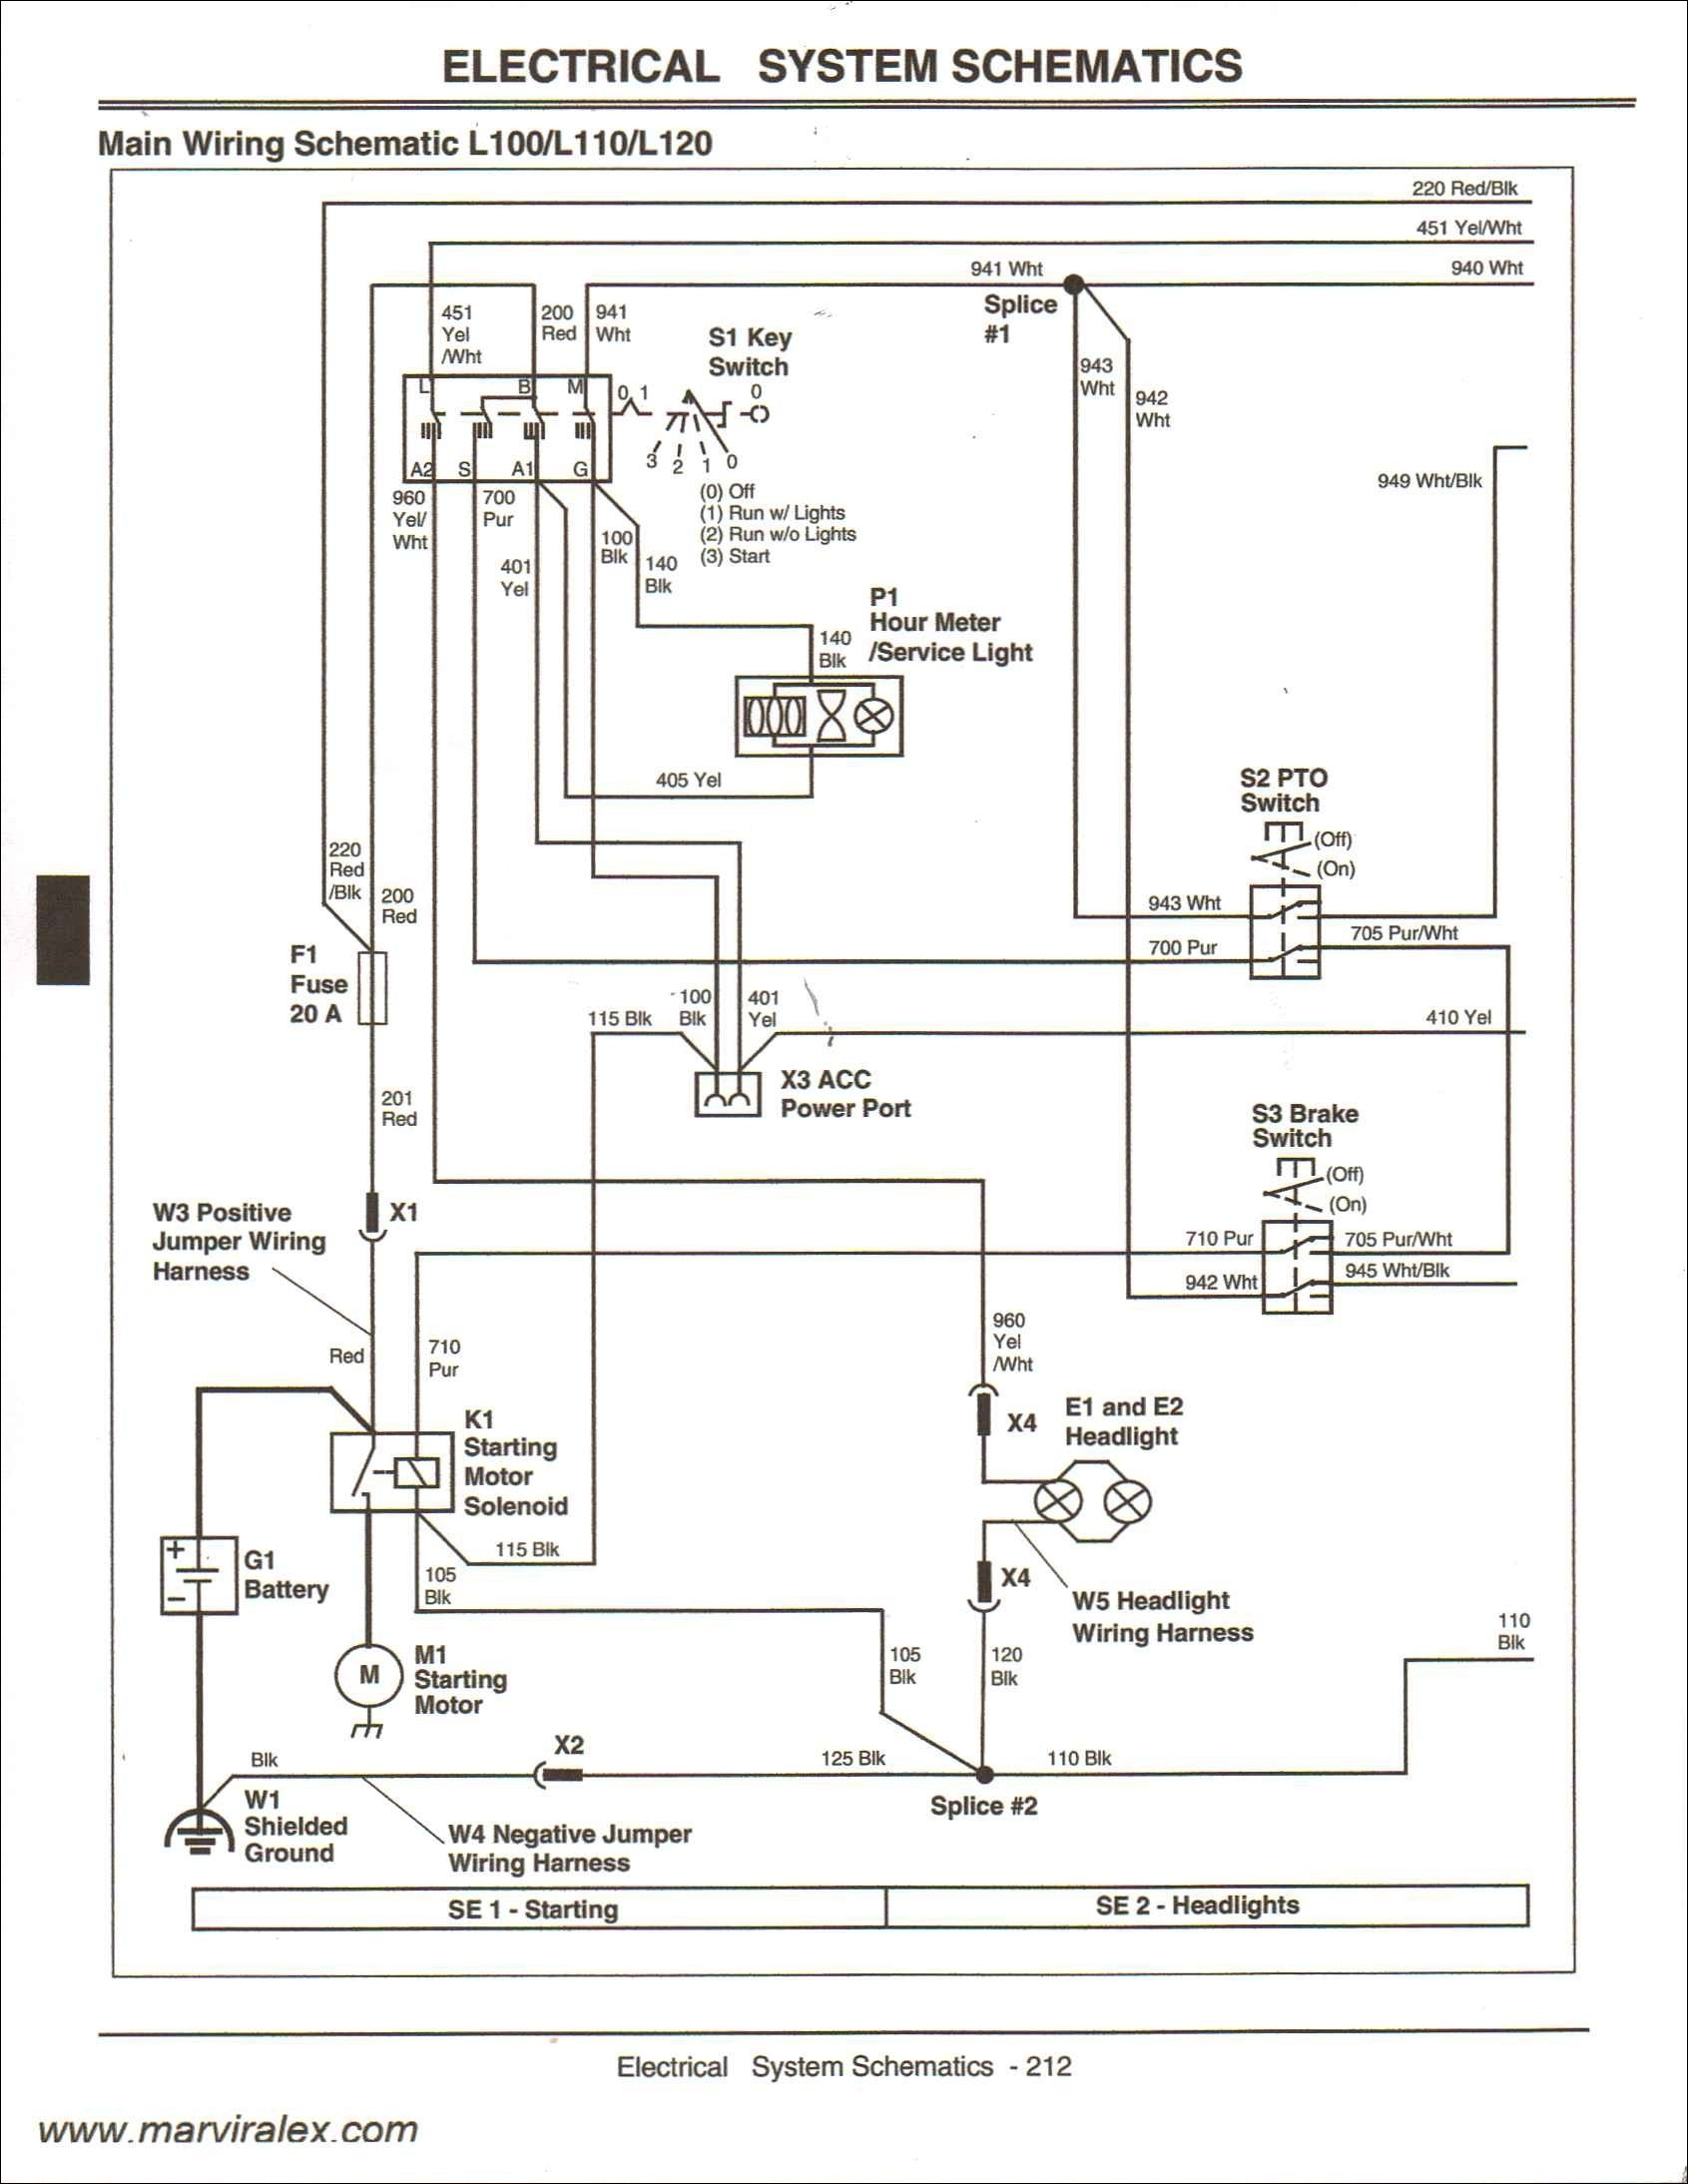 Electrical Schematic 345 John Deere Tractor Kn 1432] John Deere Gator Ignition Wiring Diagram View Of Electrical Schematic 345 John Deere Tractor